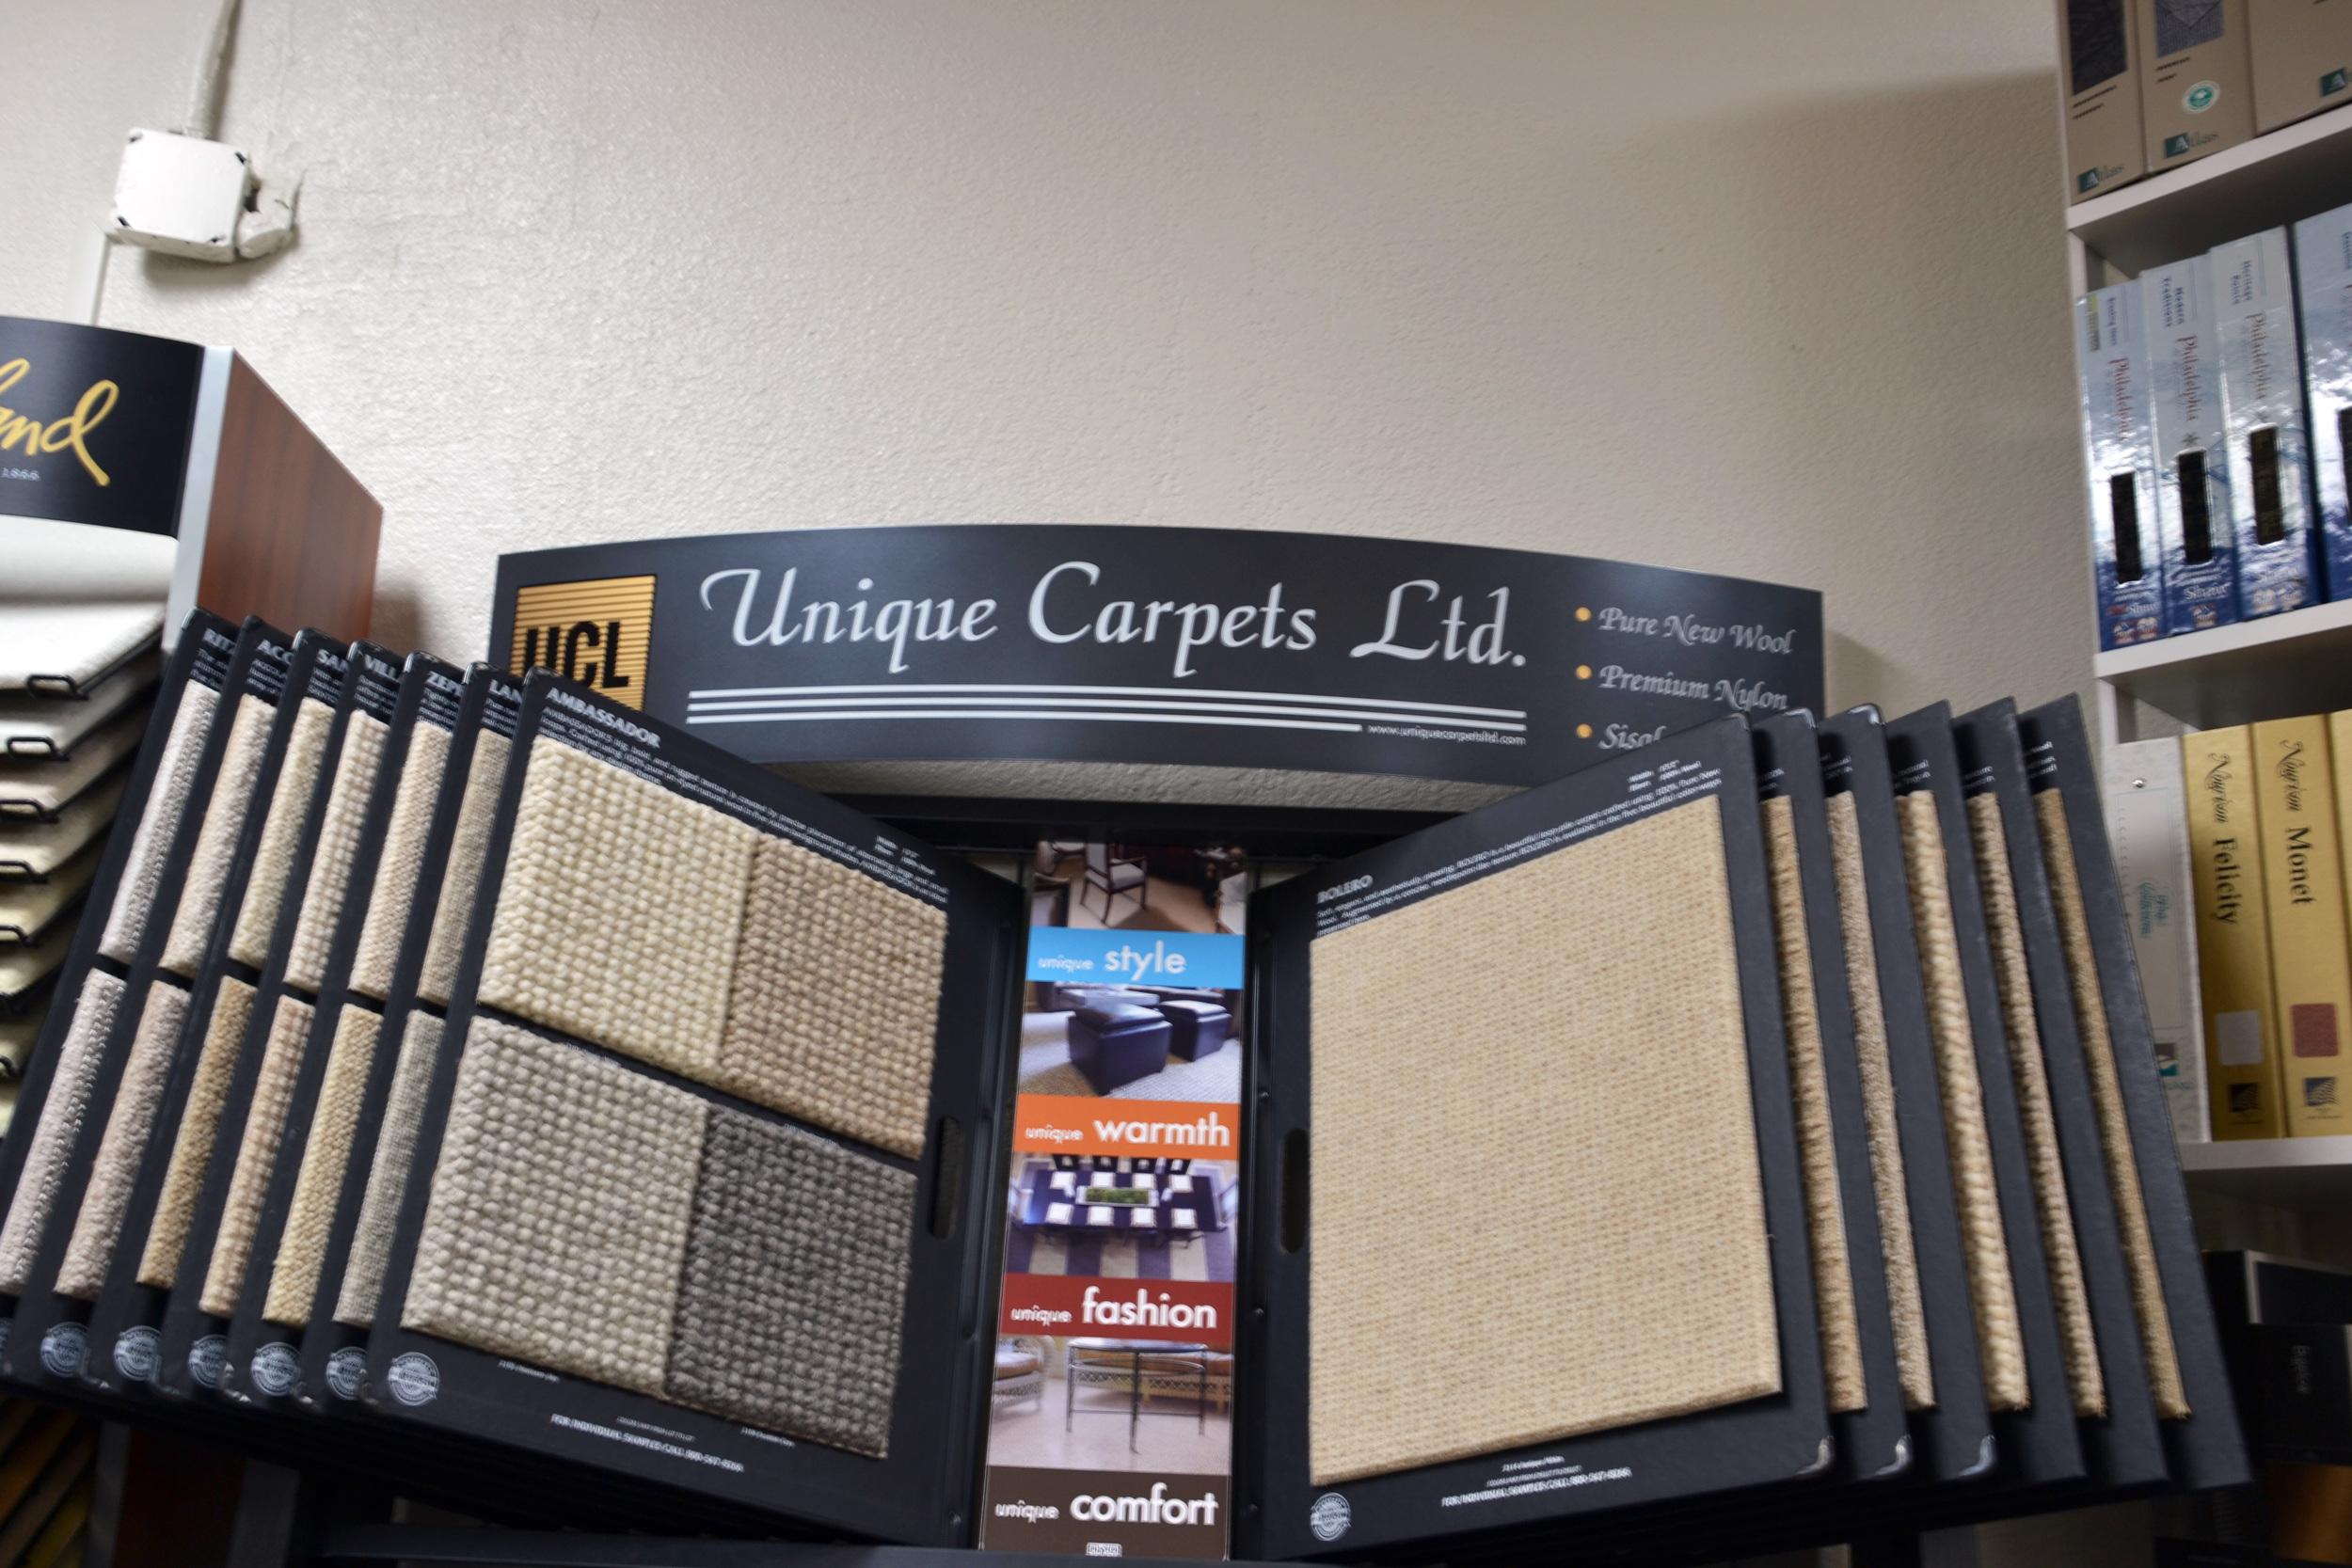 display-unique-carpets.jpg